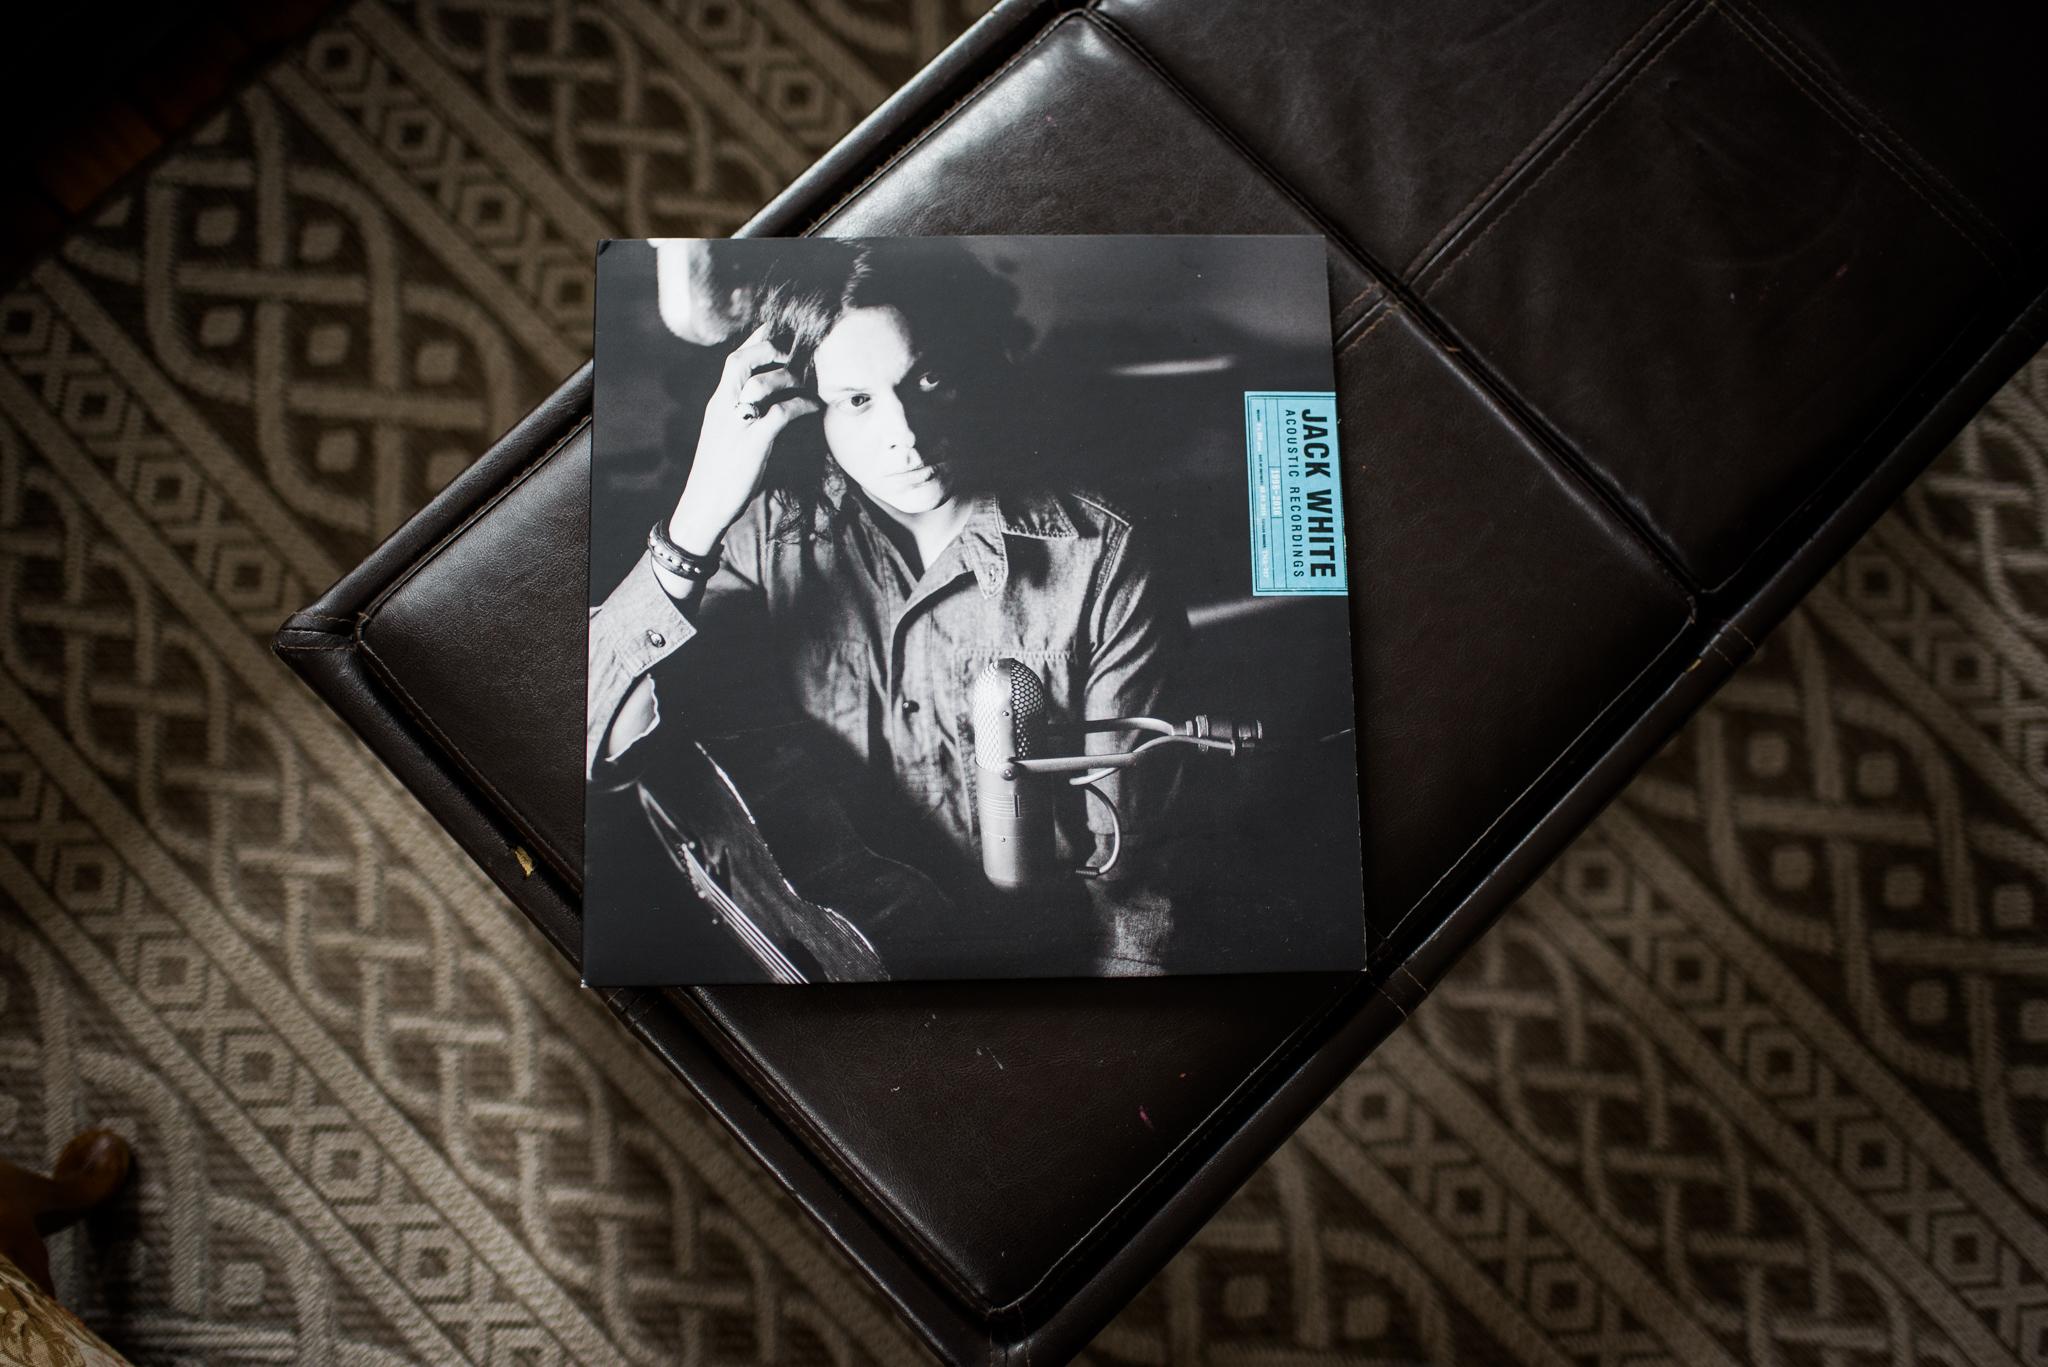 Jack white on vinyl